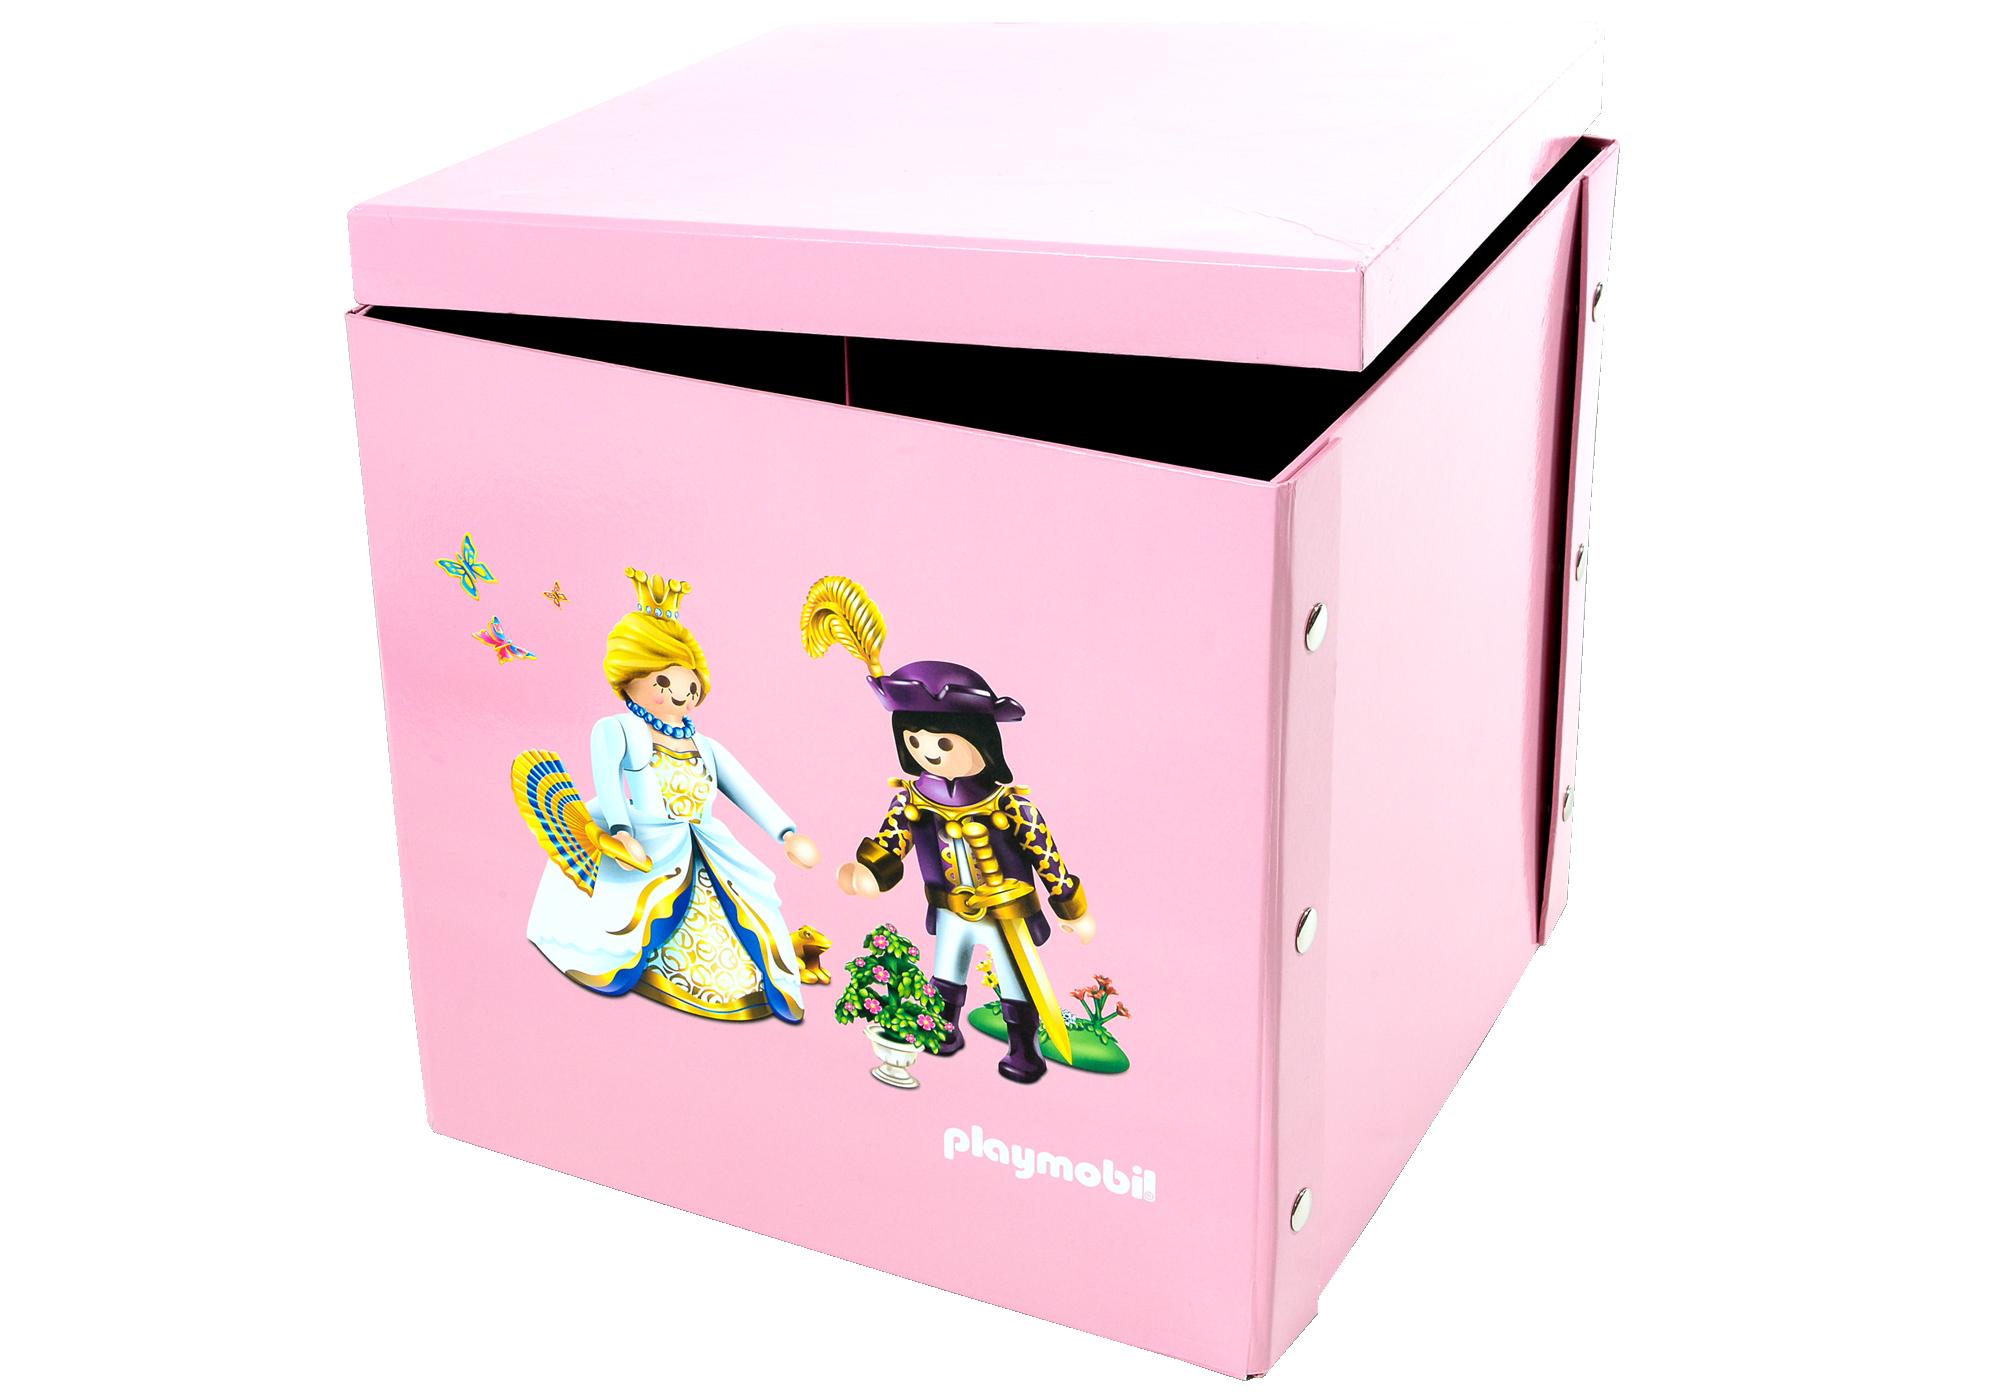 http://media.playmobil.com/i/playmobil/80463_product_detail/Prinzessinnen-Mehrzweck-Box